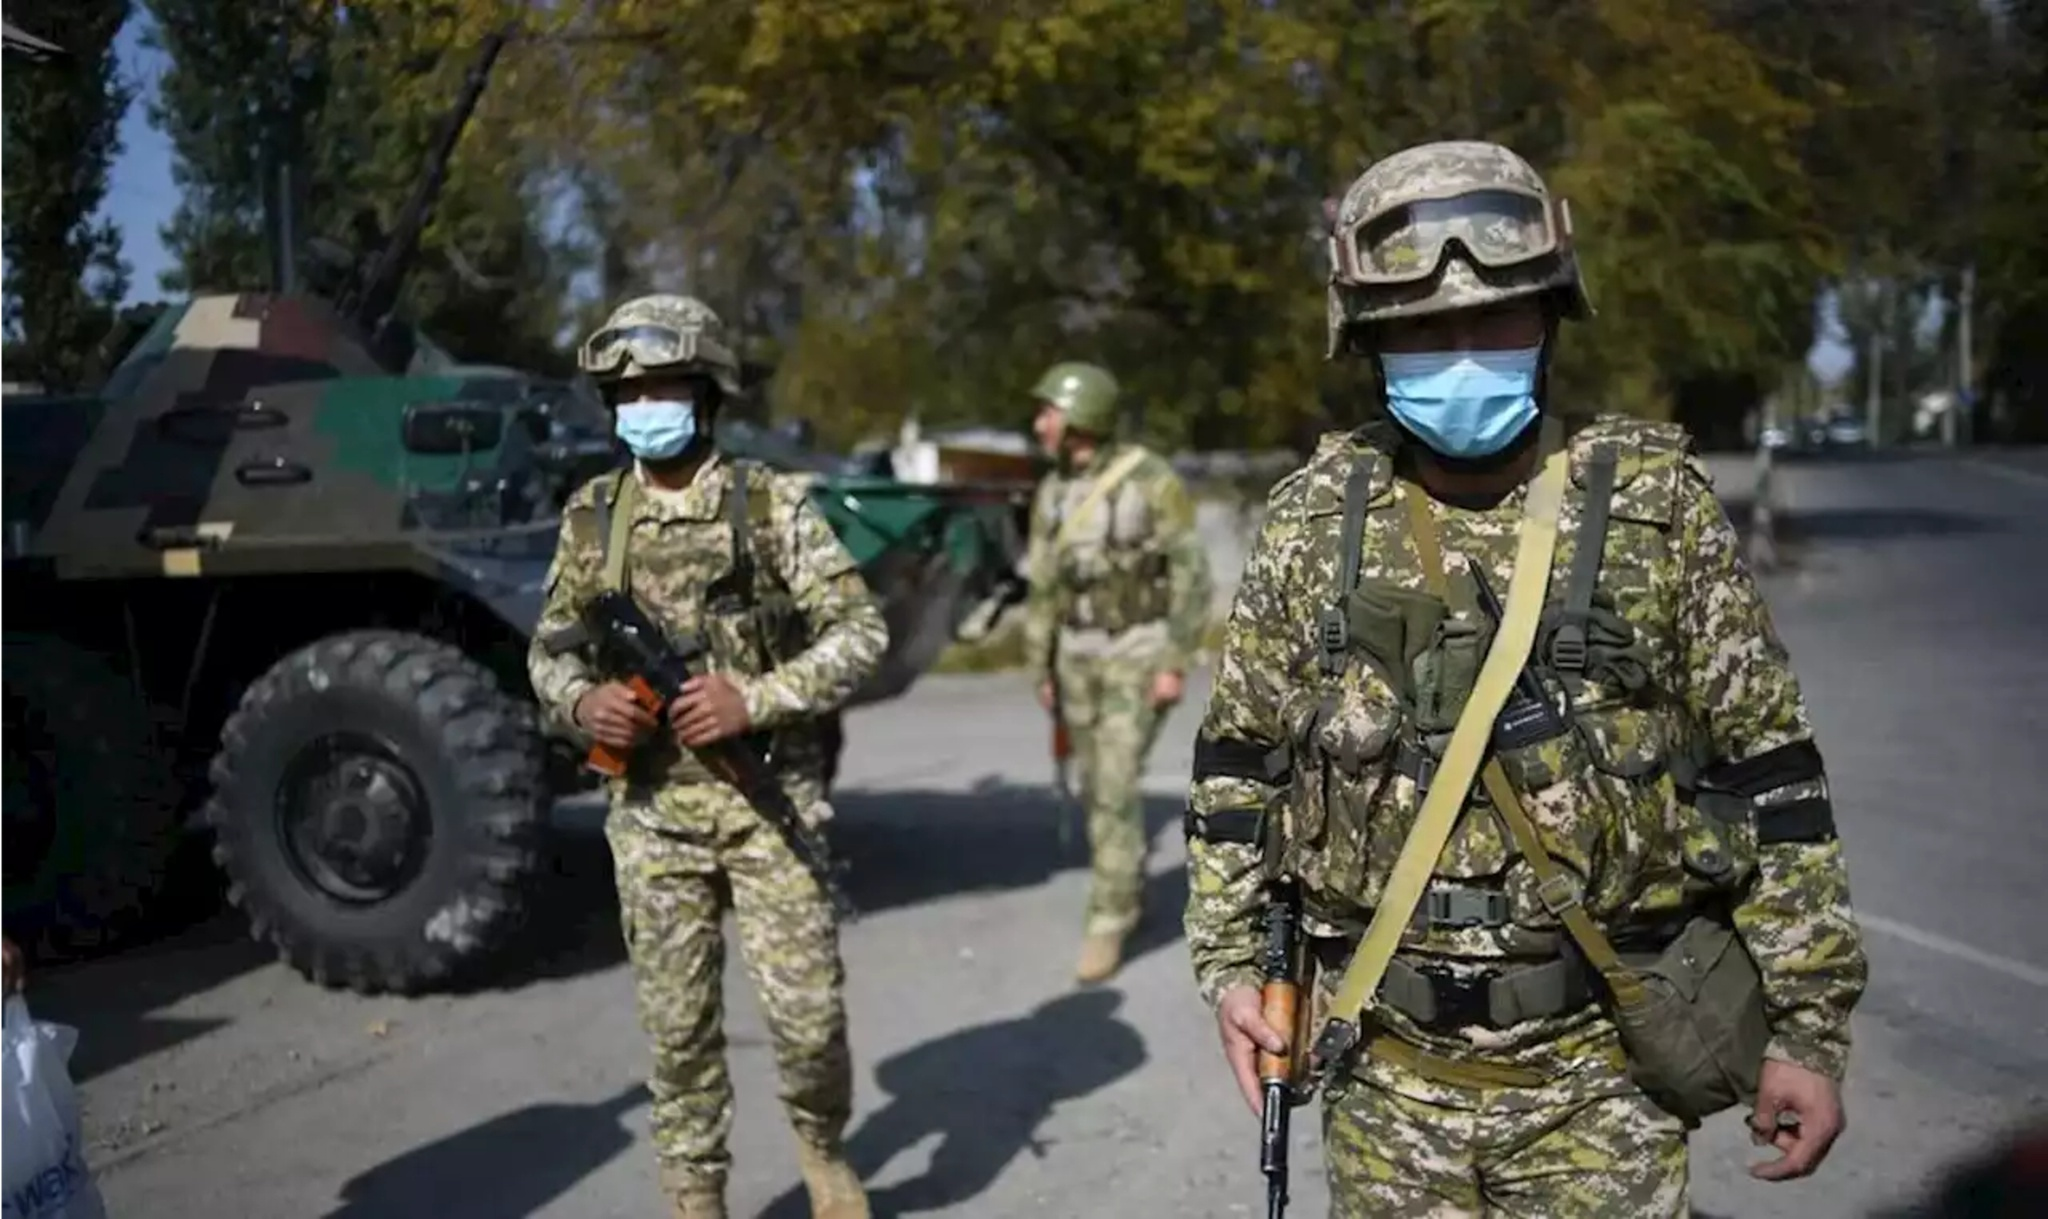 Binh lính Kyrgyzstan tại thủ đô Bishkek /// Ảnh: AFP